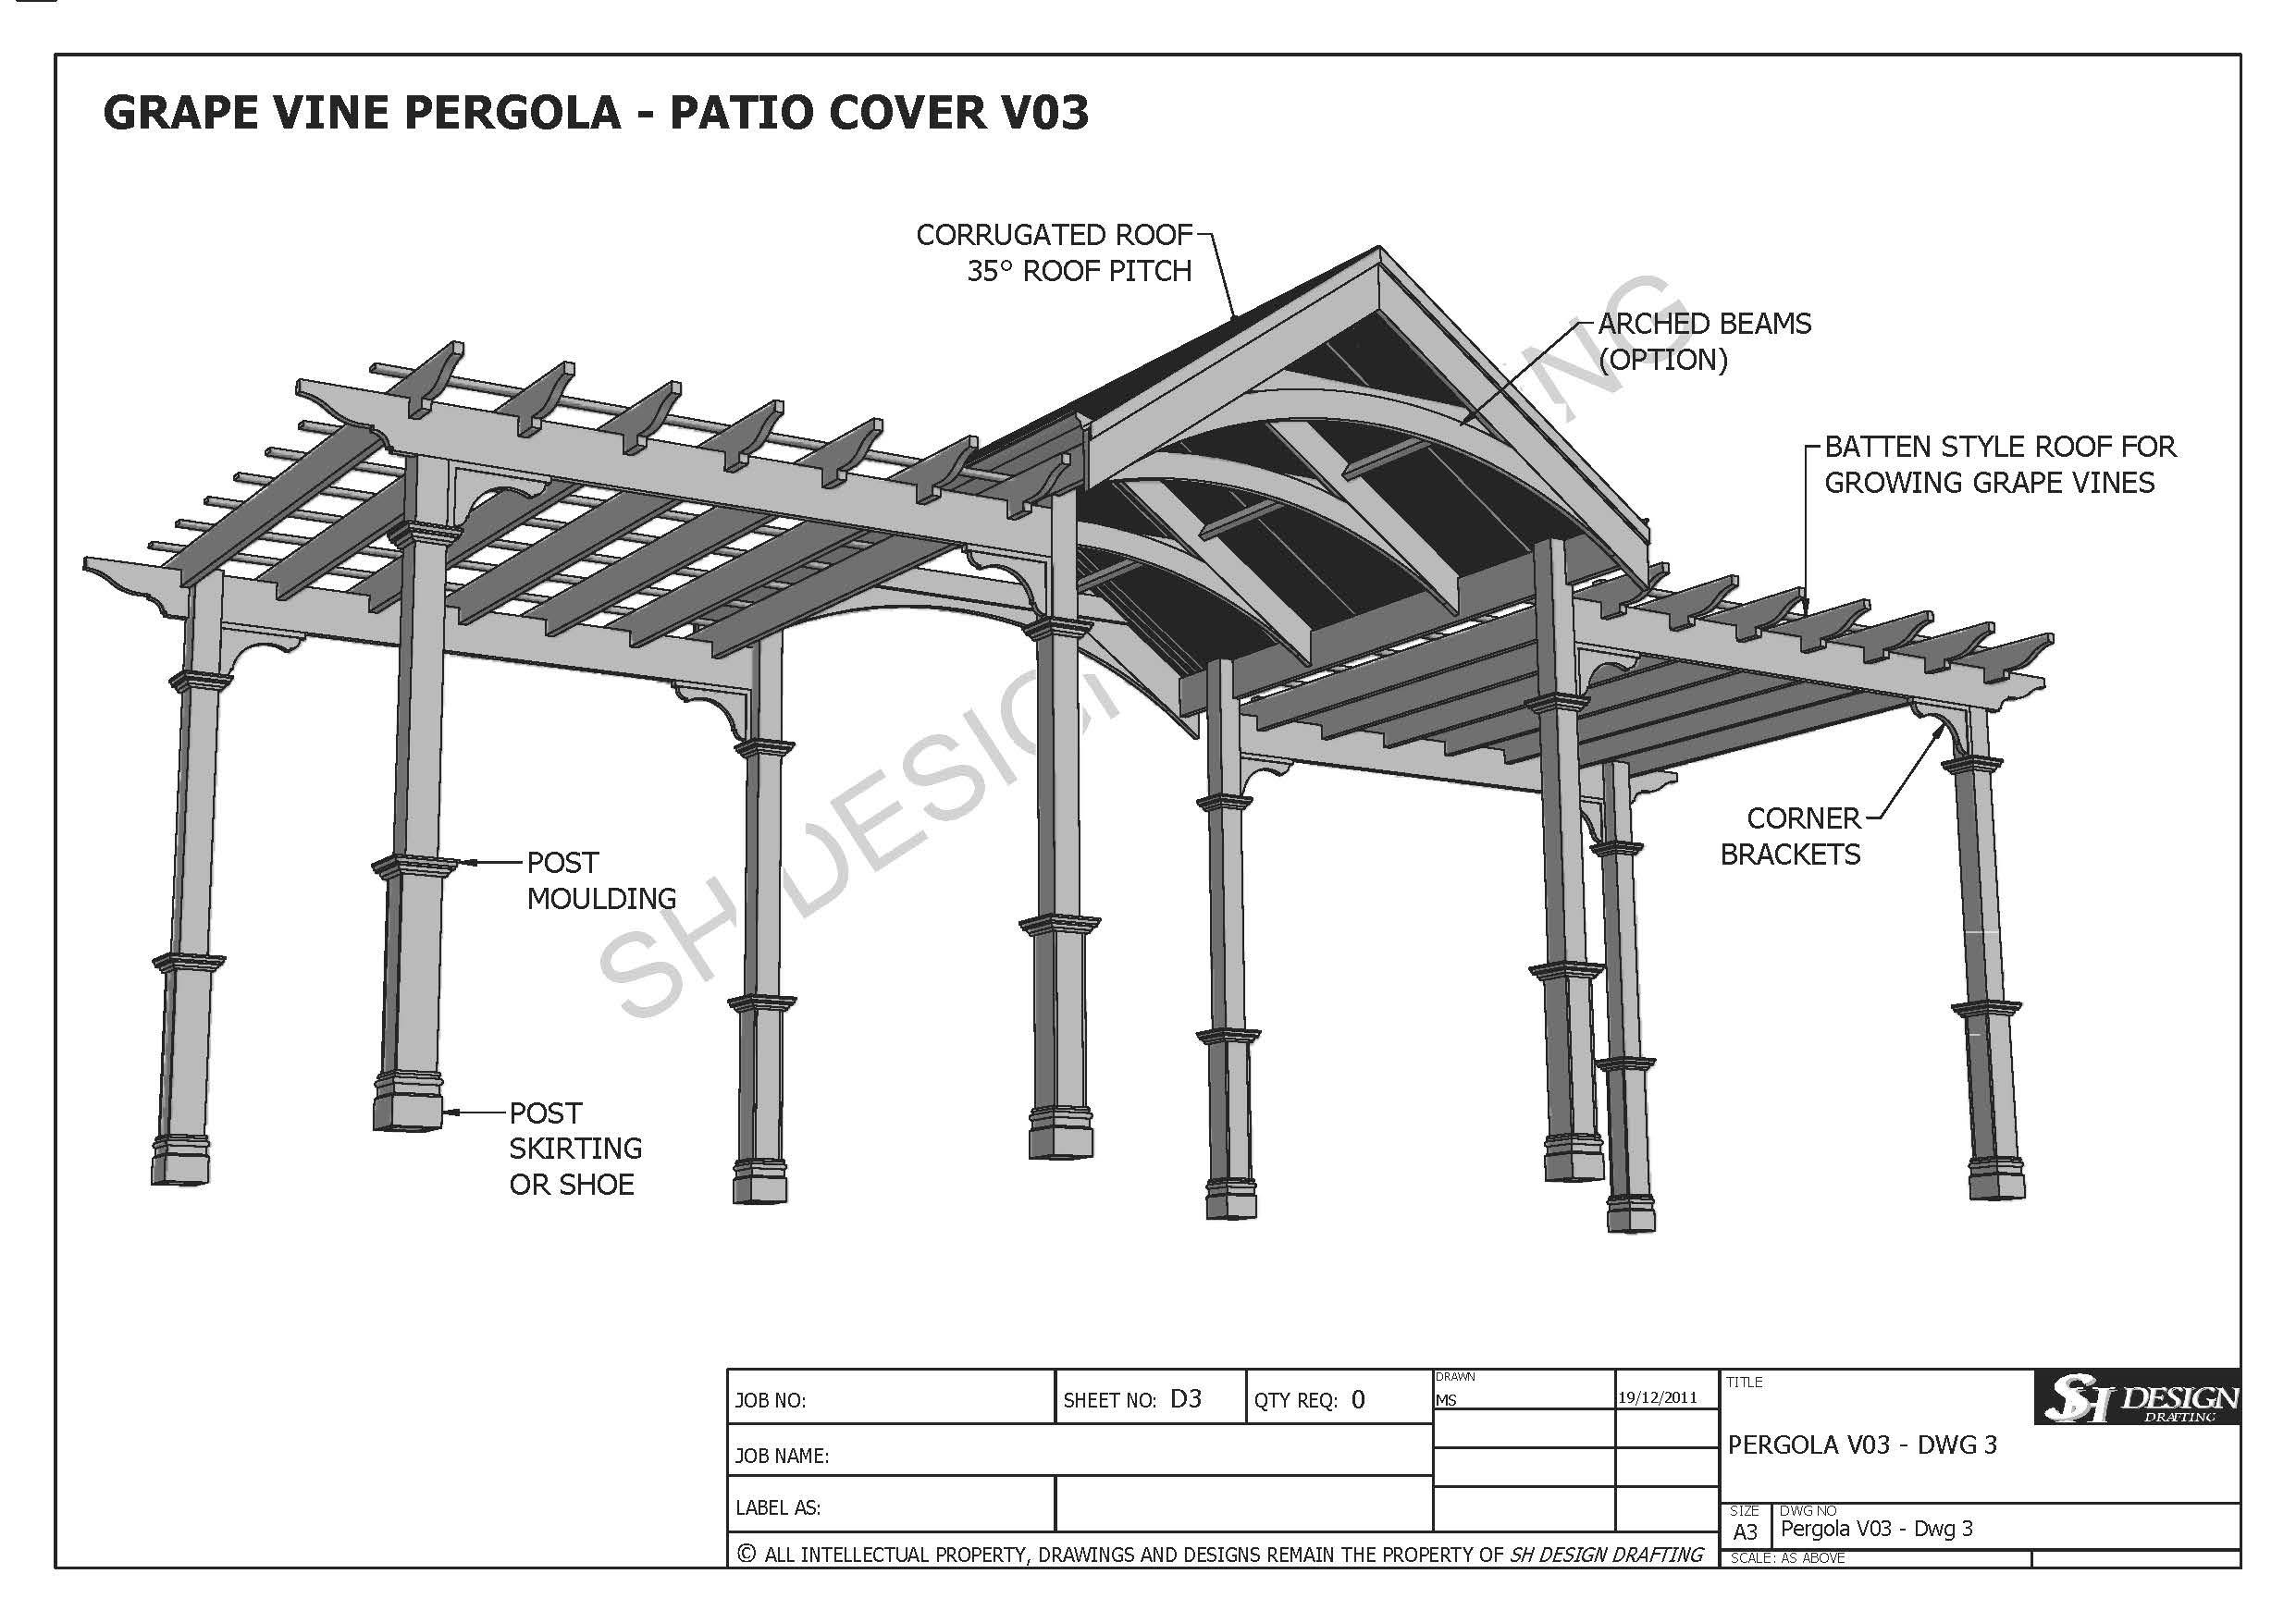 GRAPE VINE OUTDOOR PERGOLA - PATIO COVER VERANDA V3 - Full ... on Patio Cover Decorating Ideas id=69793